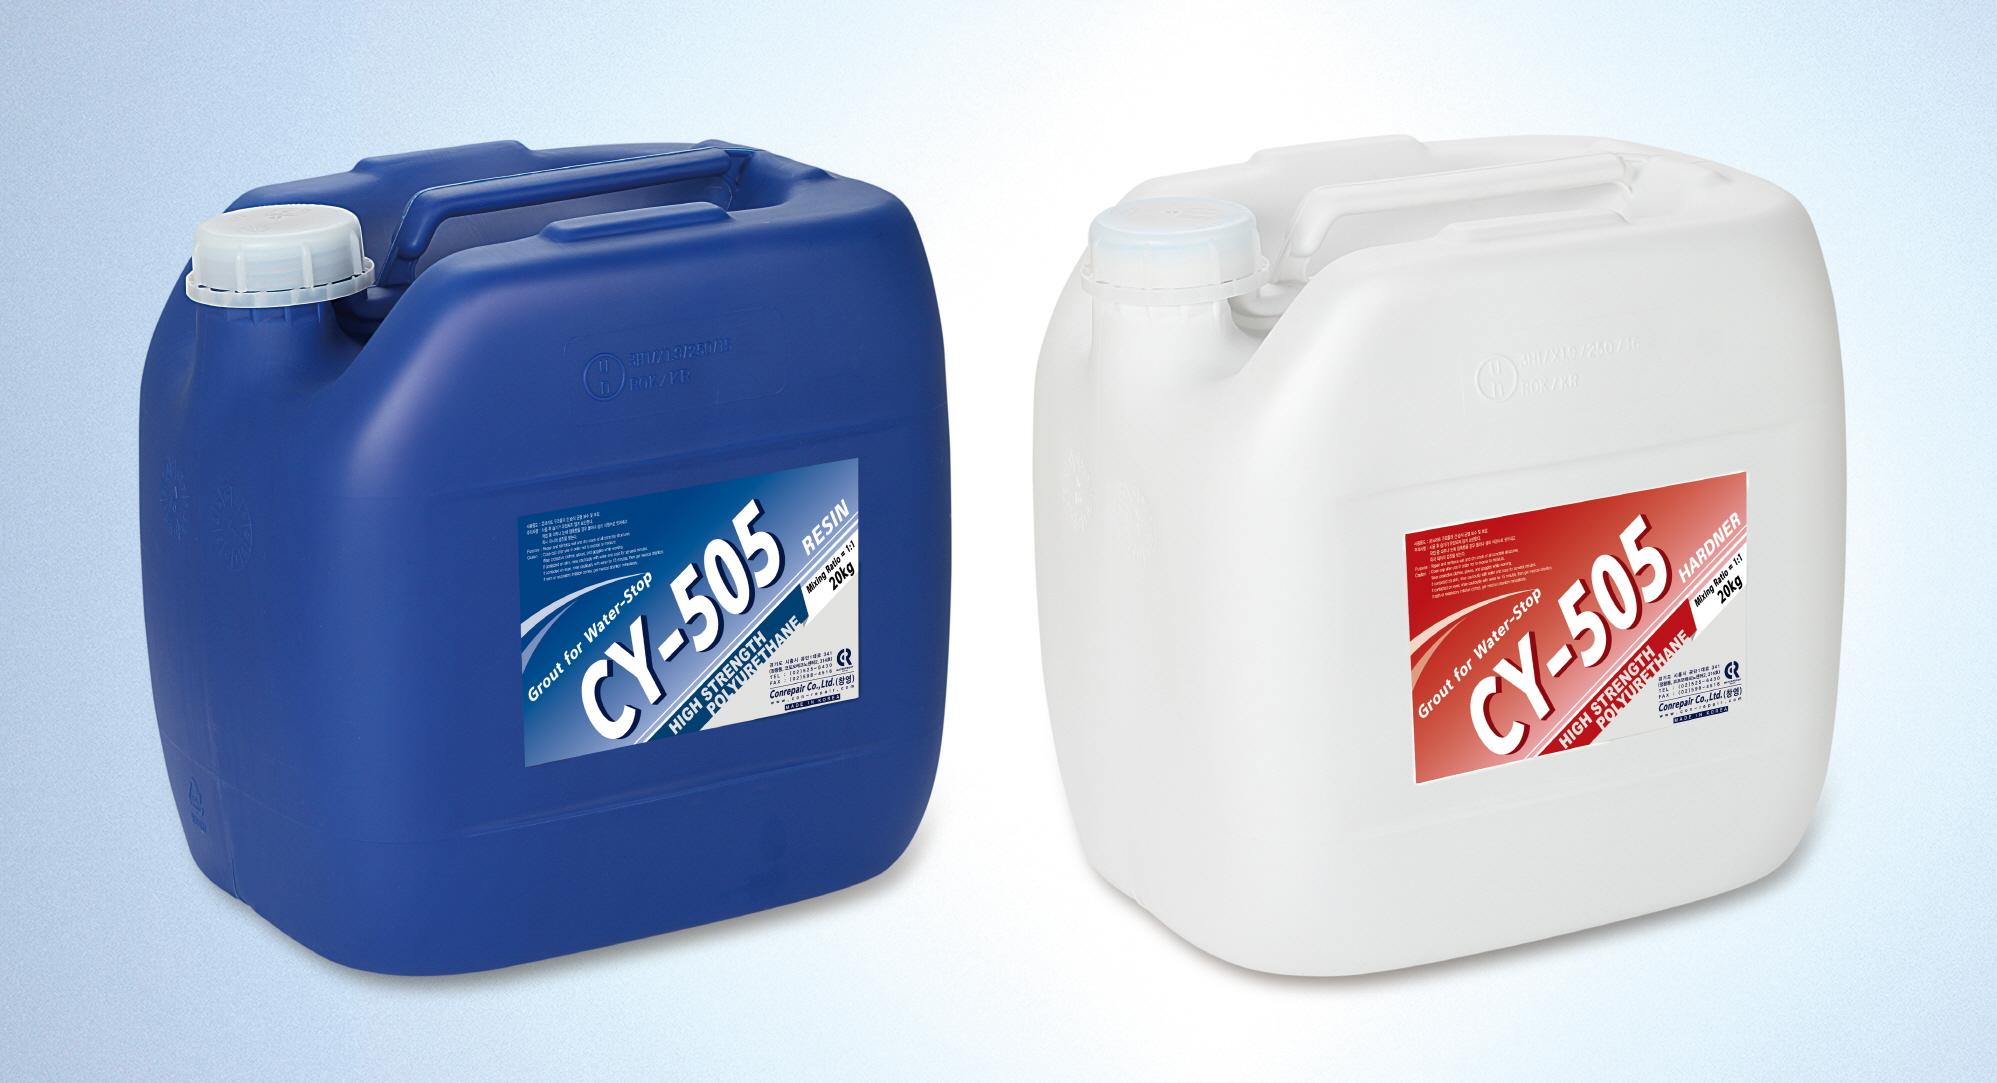 CY-505 high strength polyurethane